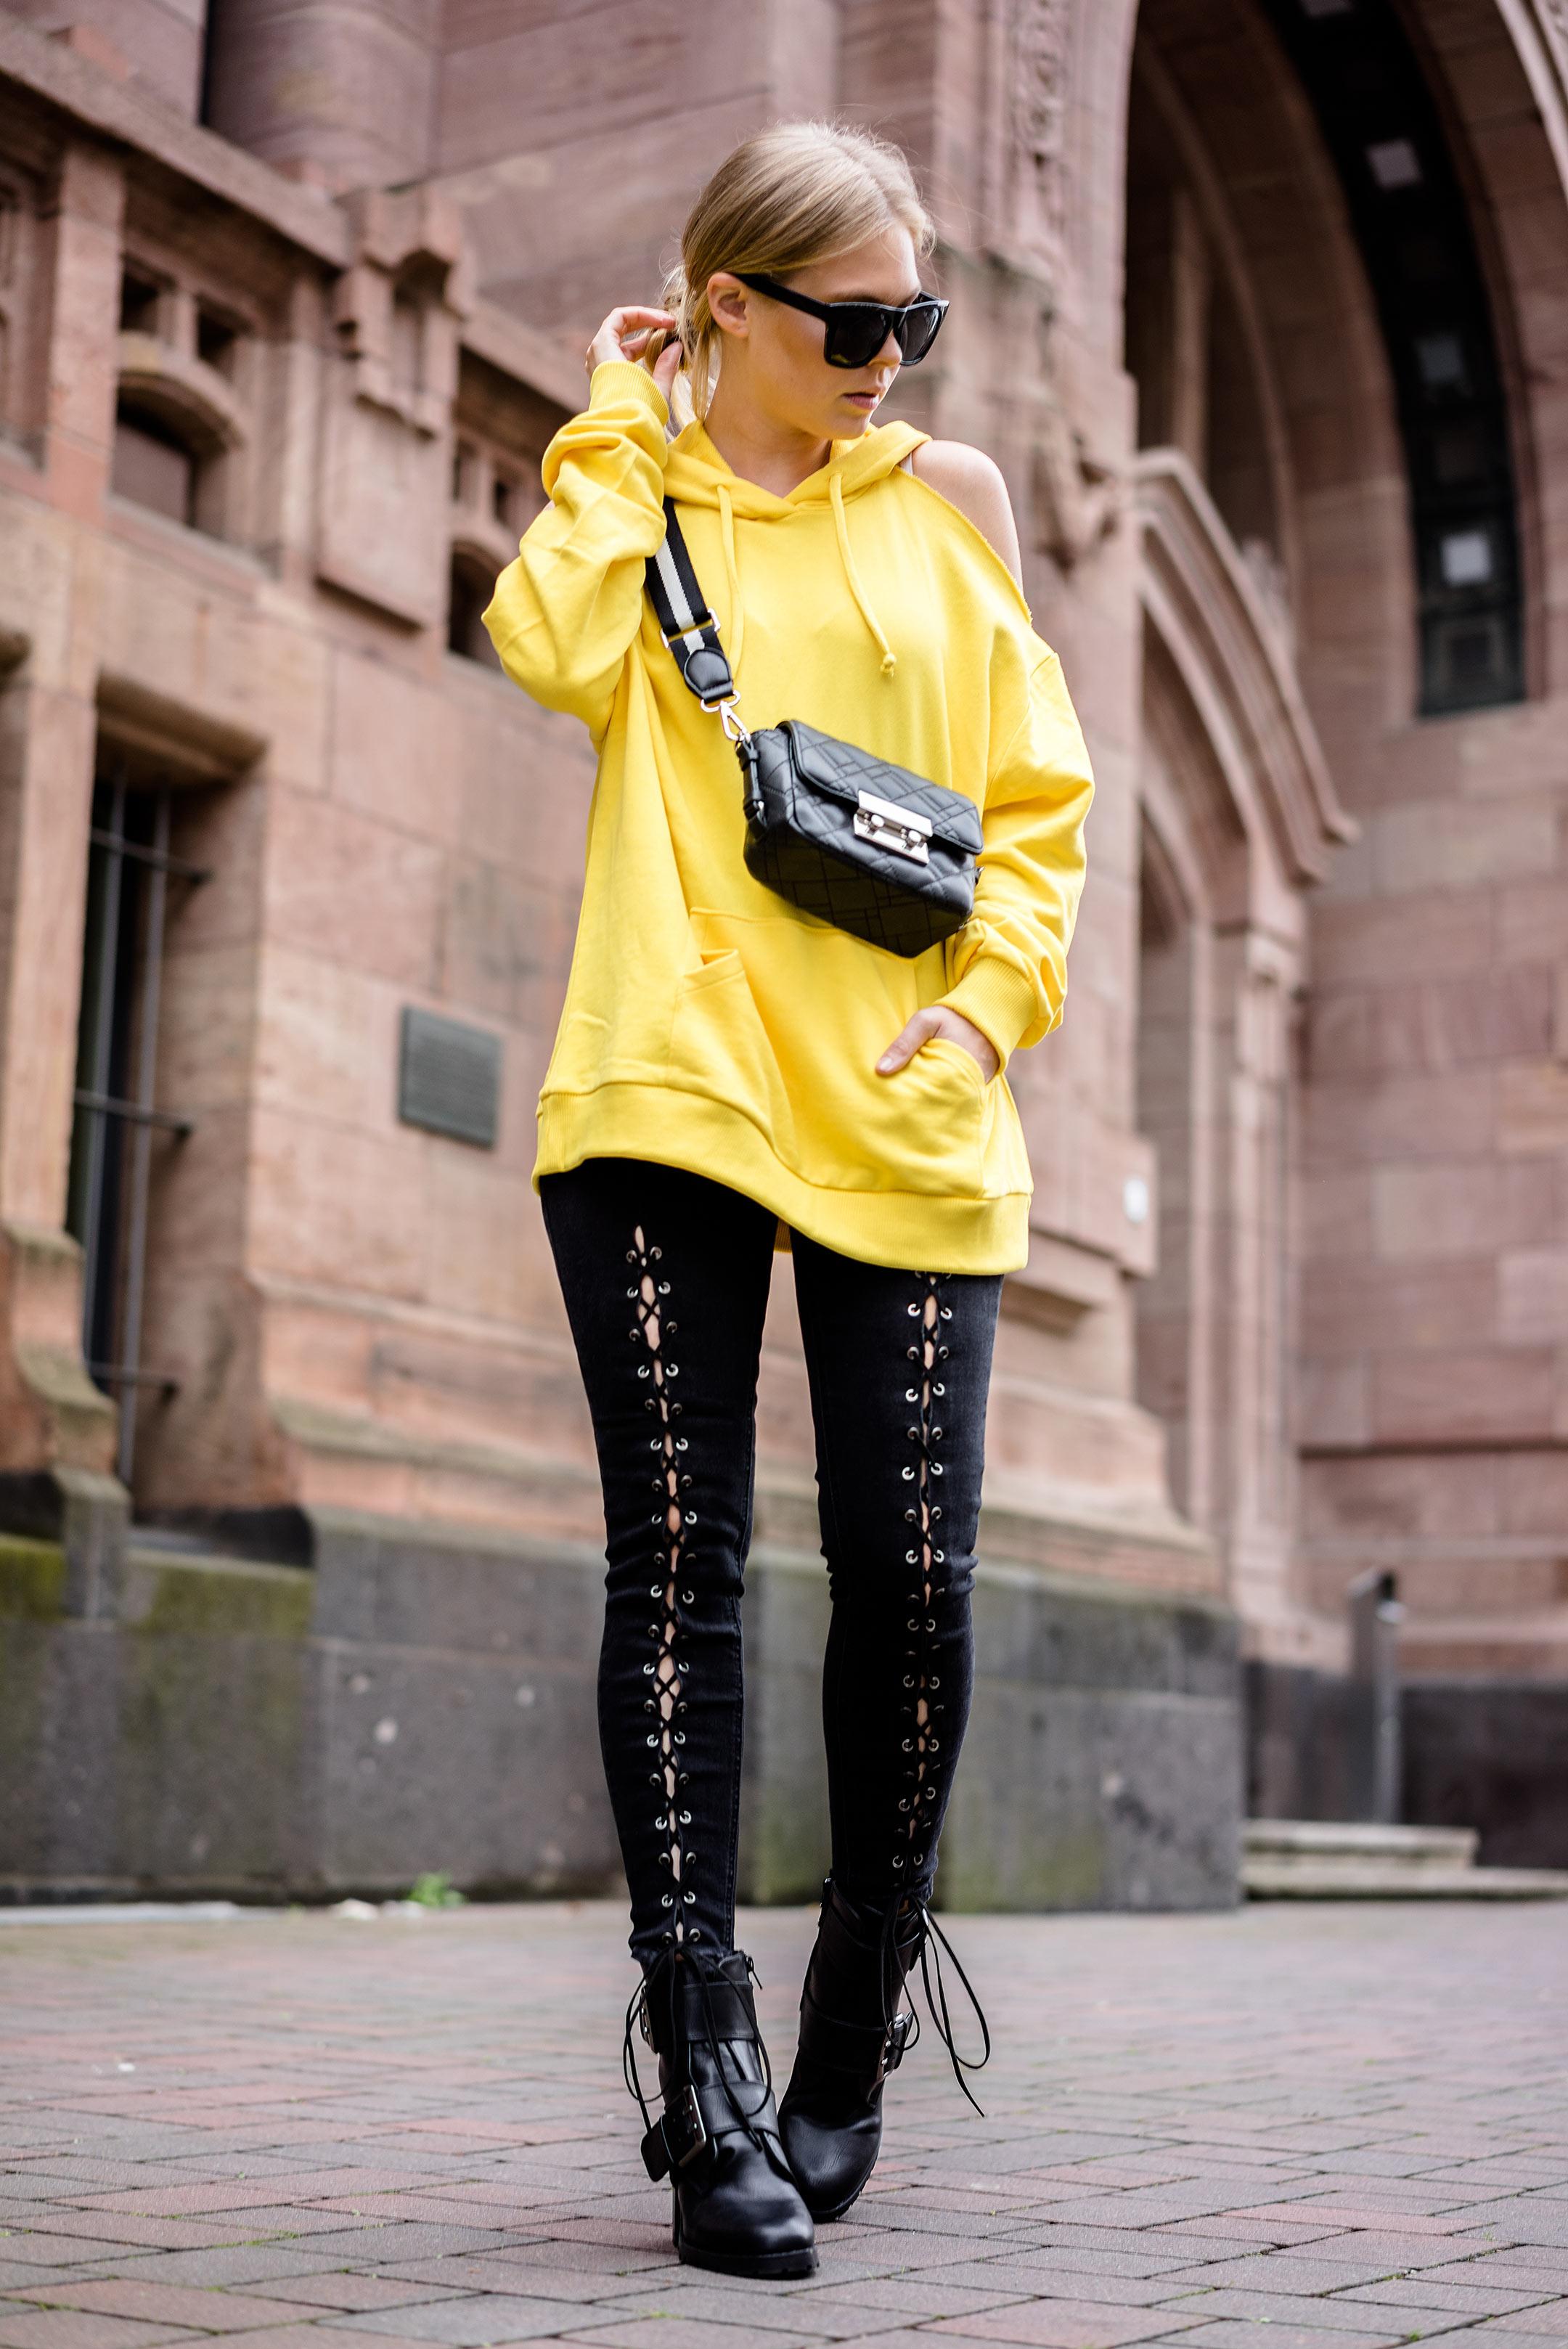 Streetstyle Outfit Fashion Blog Düsseldorf Sunnyinga Hoodie gelb